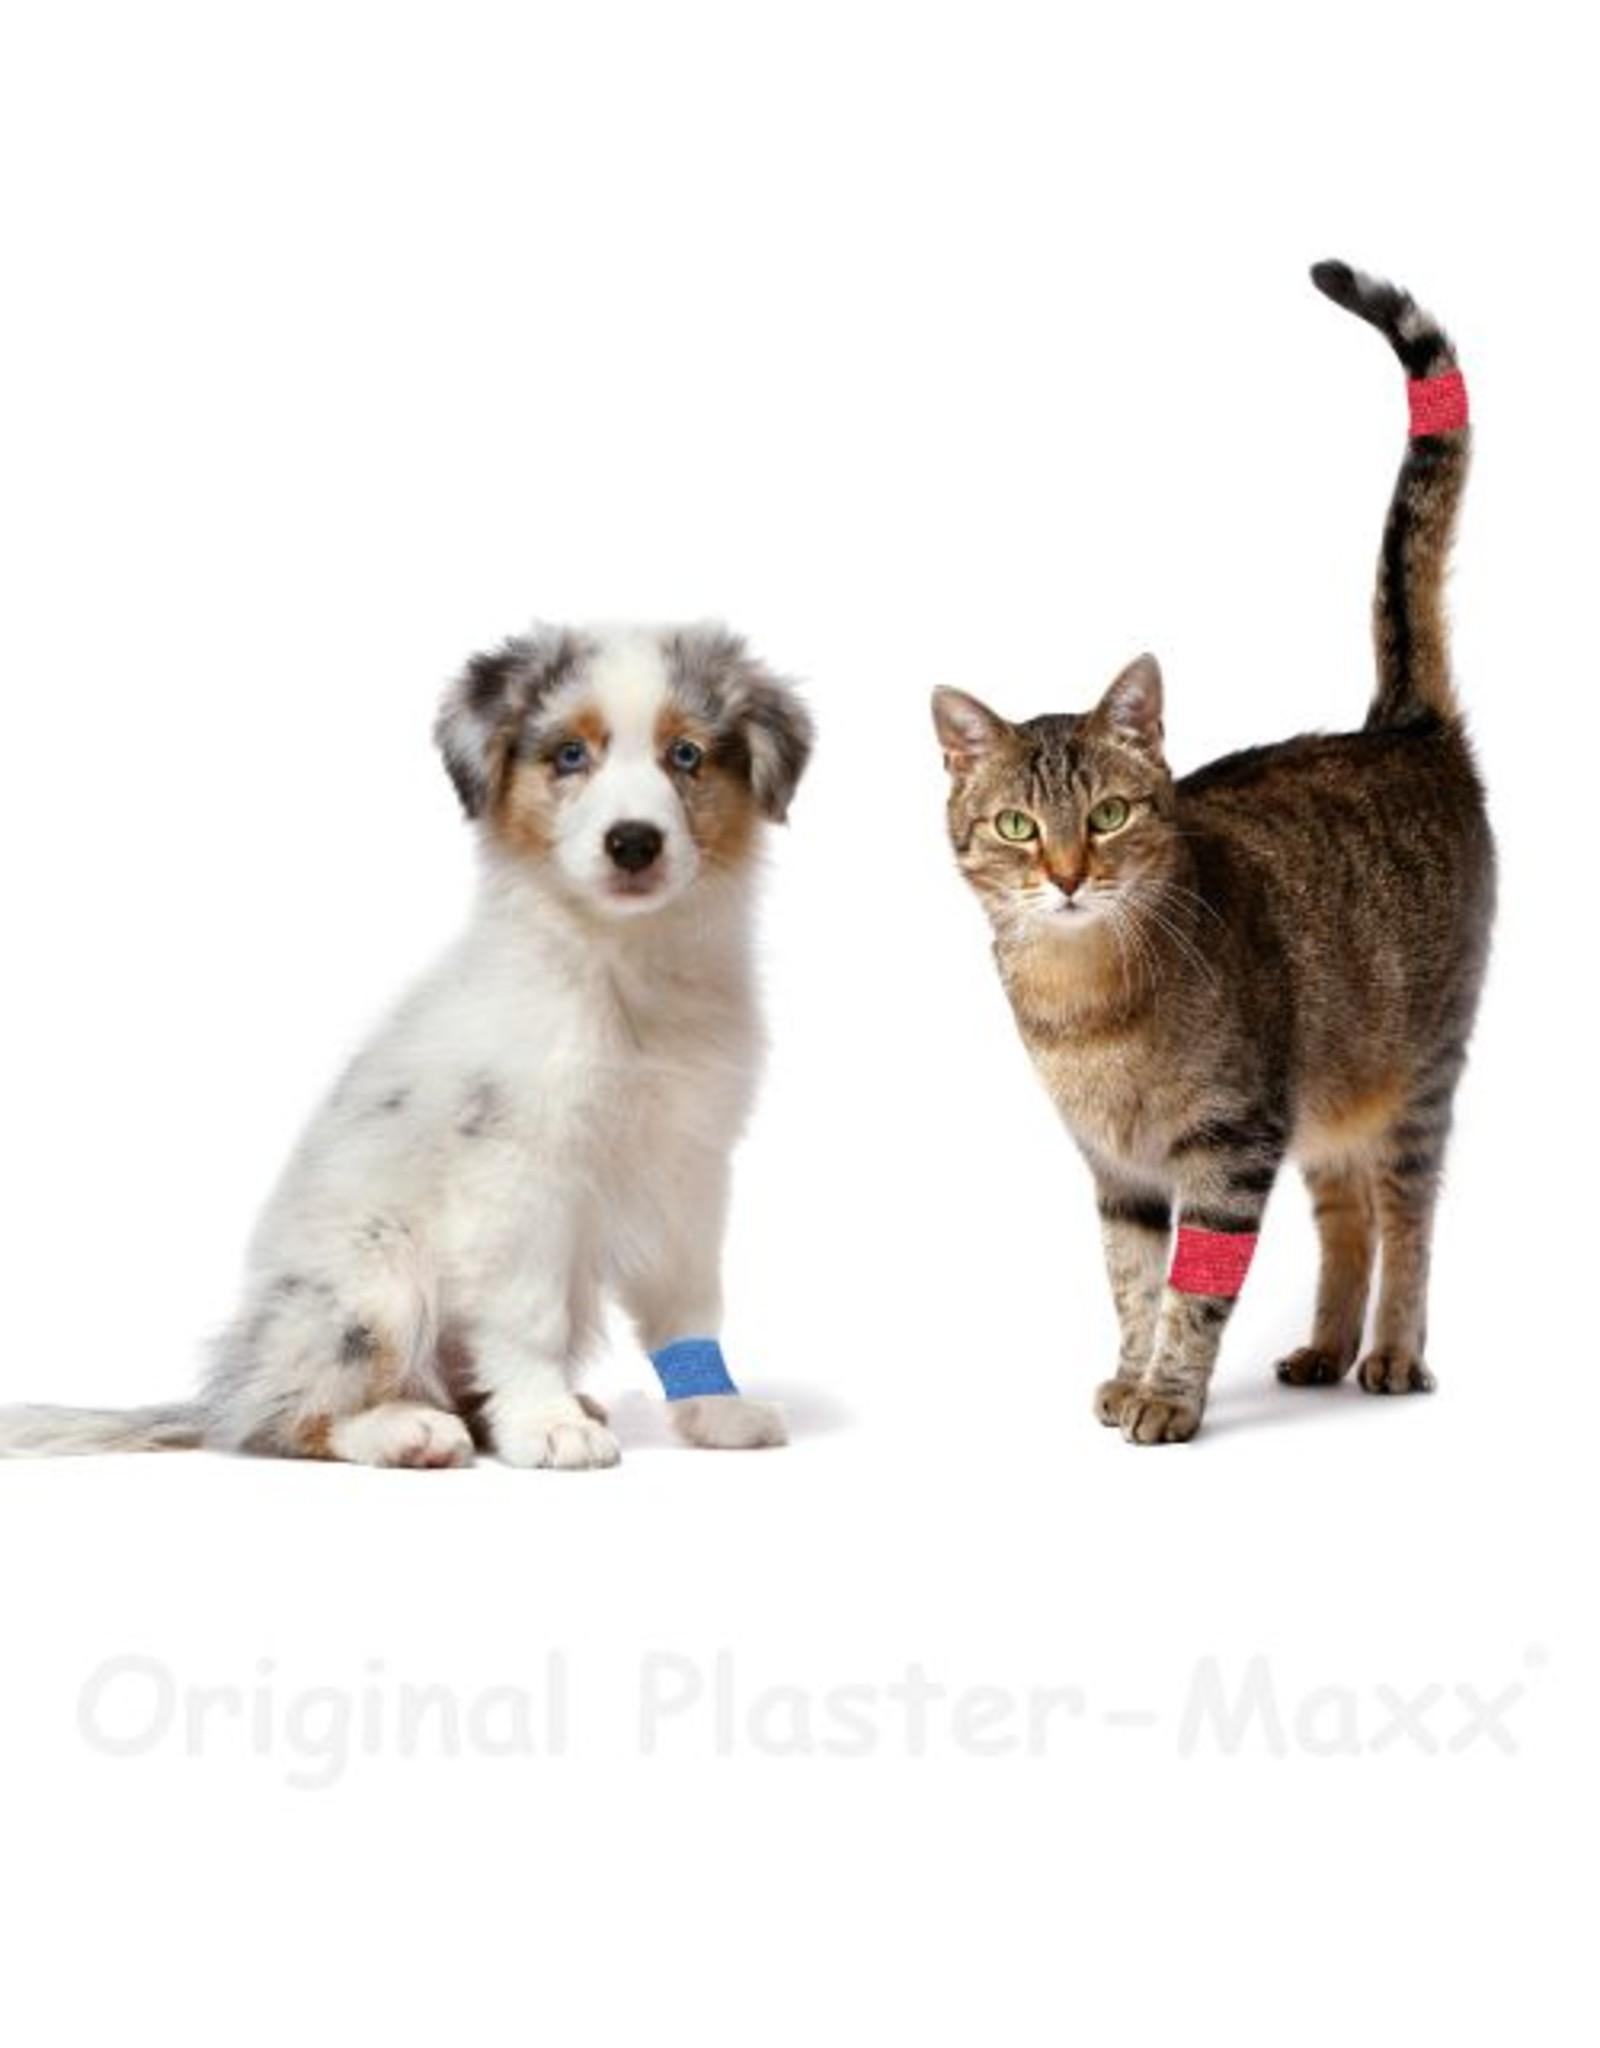 Plaster-Maxx Plaster-Maxx - Schwarz